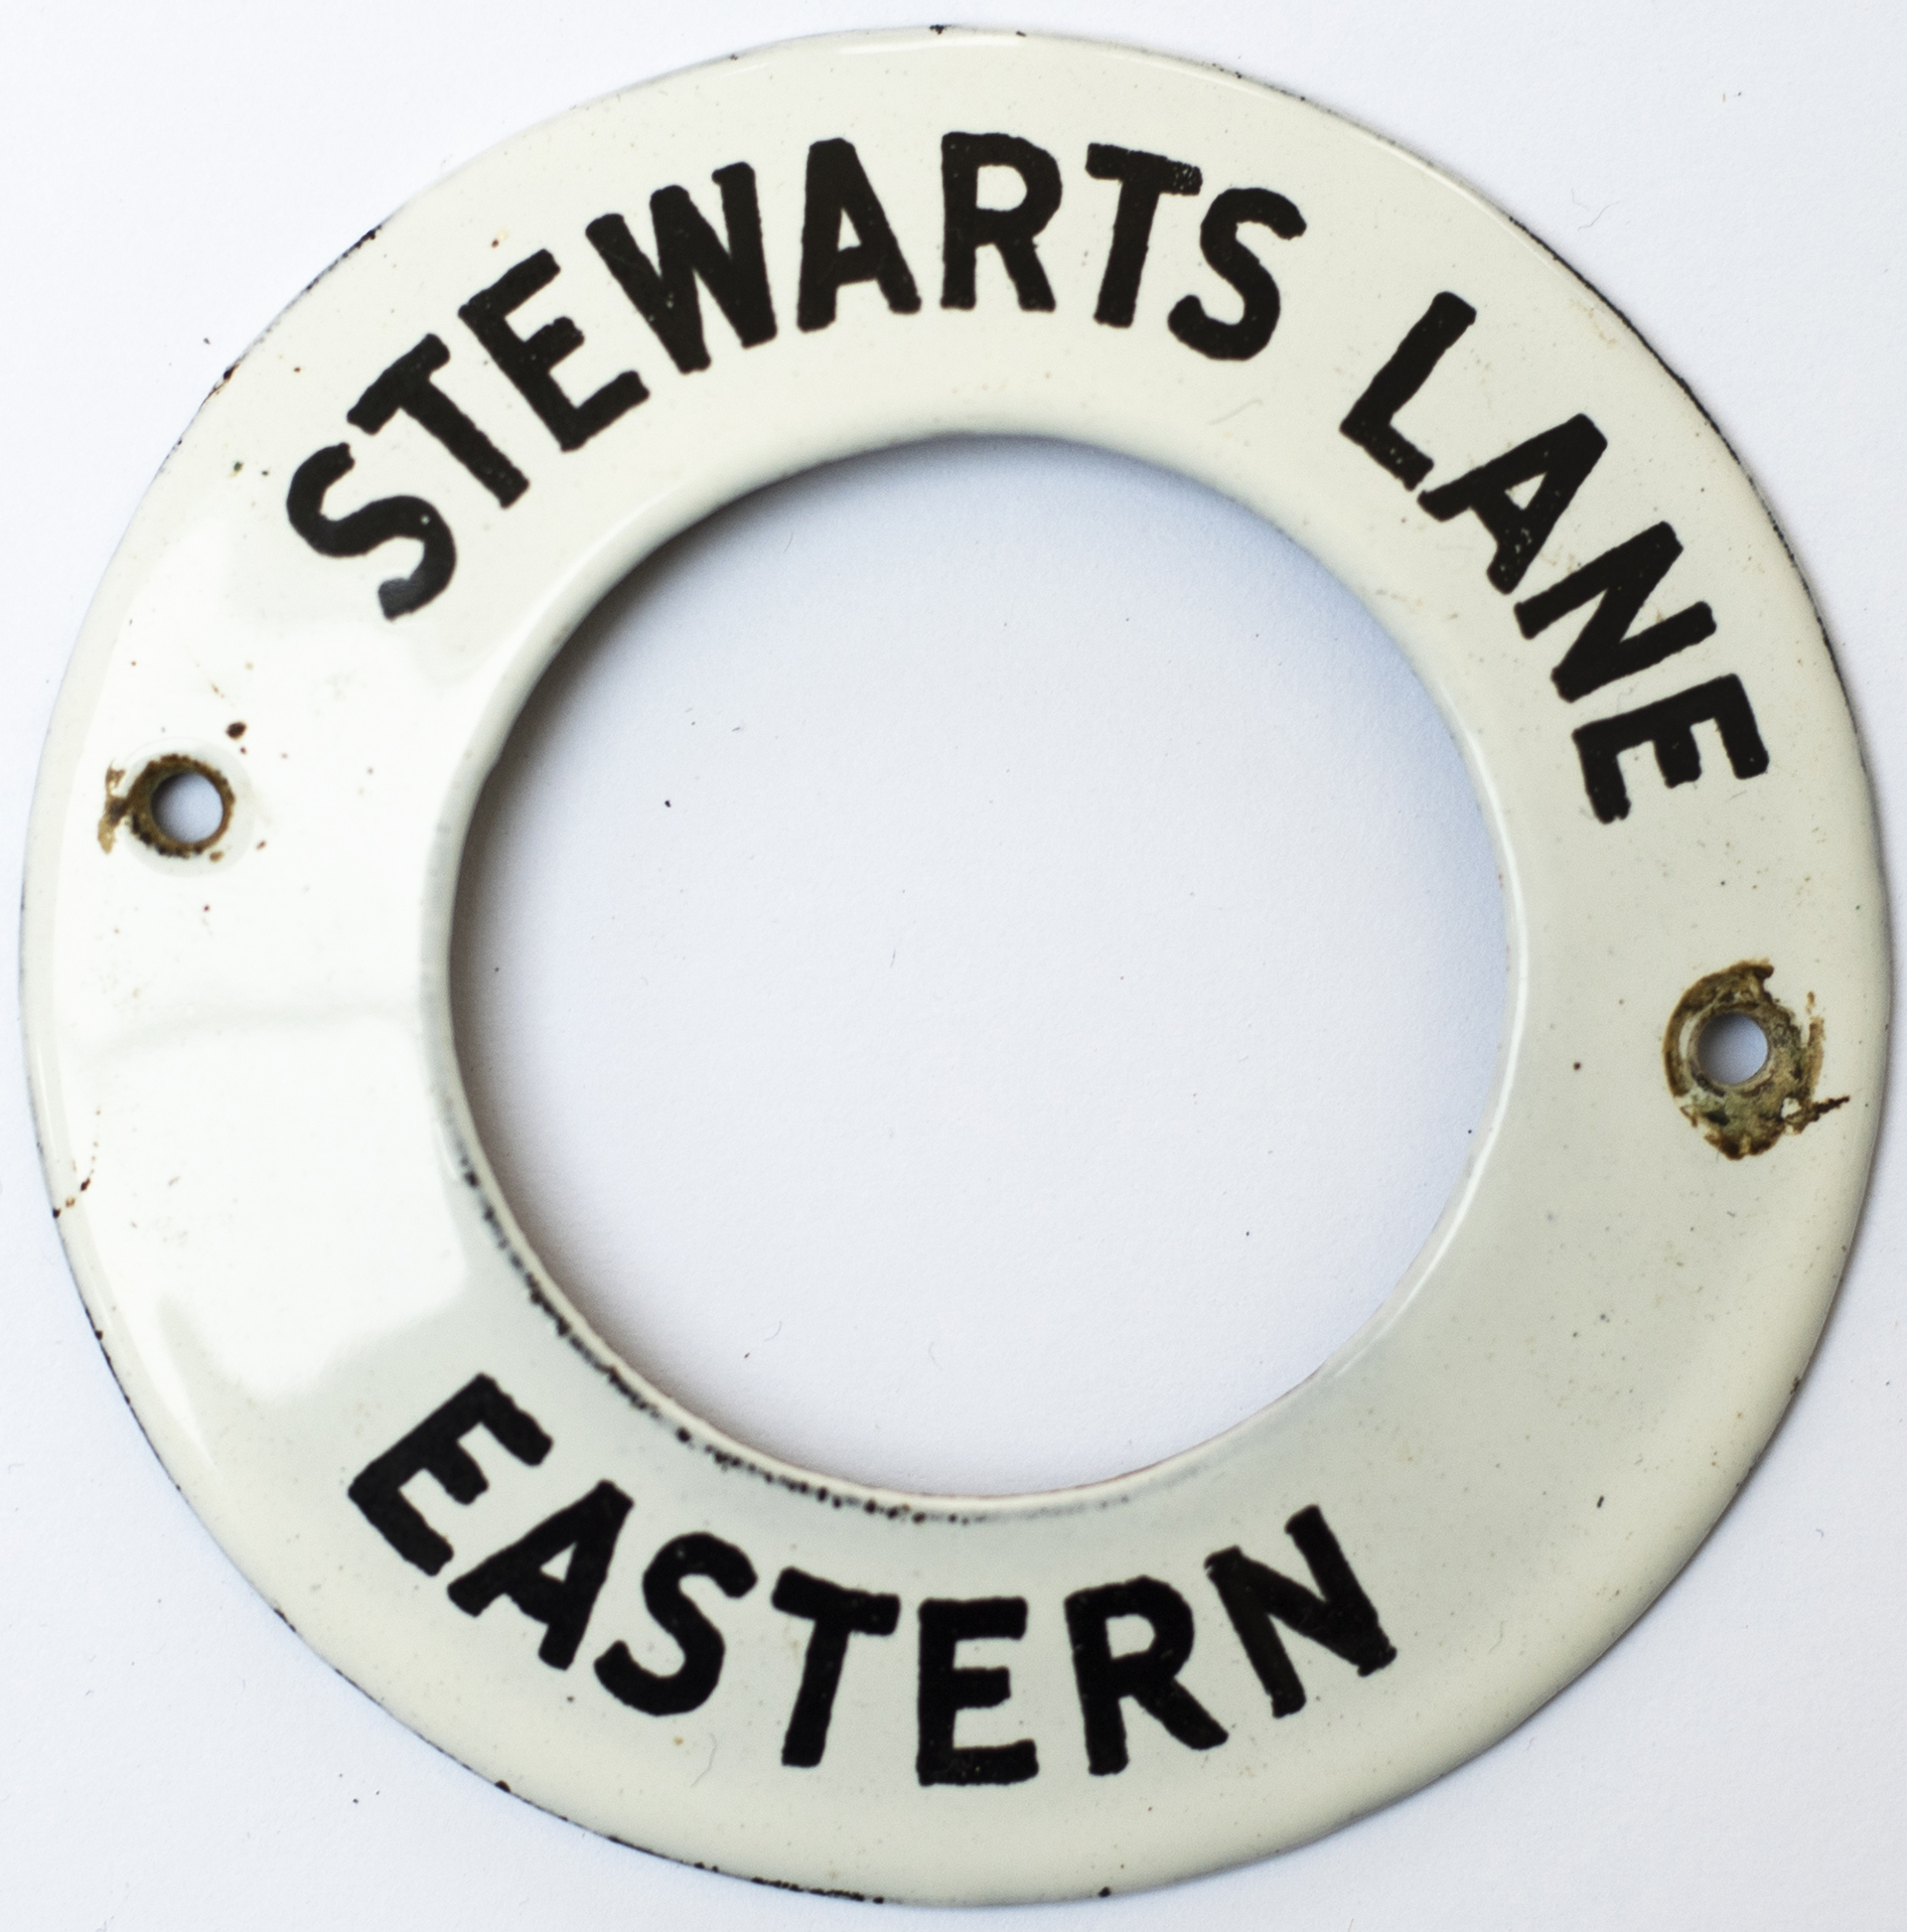 Southern Railway enamel signal box Bell Plunger ring STEWARTS LANE EASTERN. Measures 3in diameter